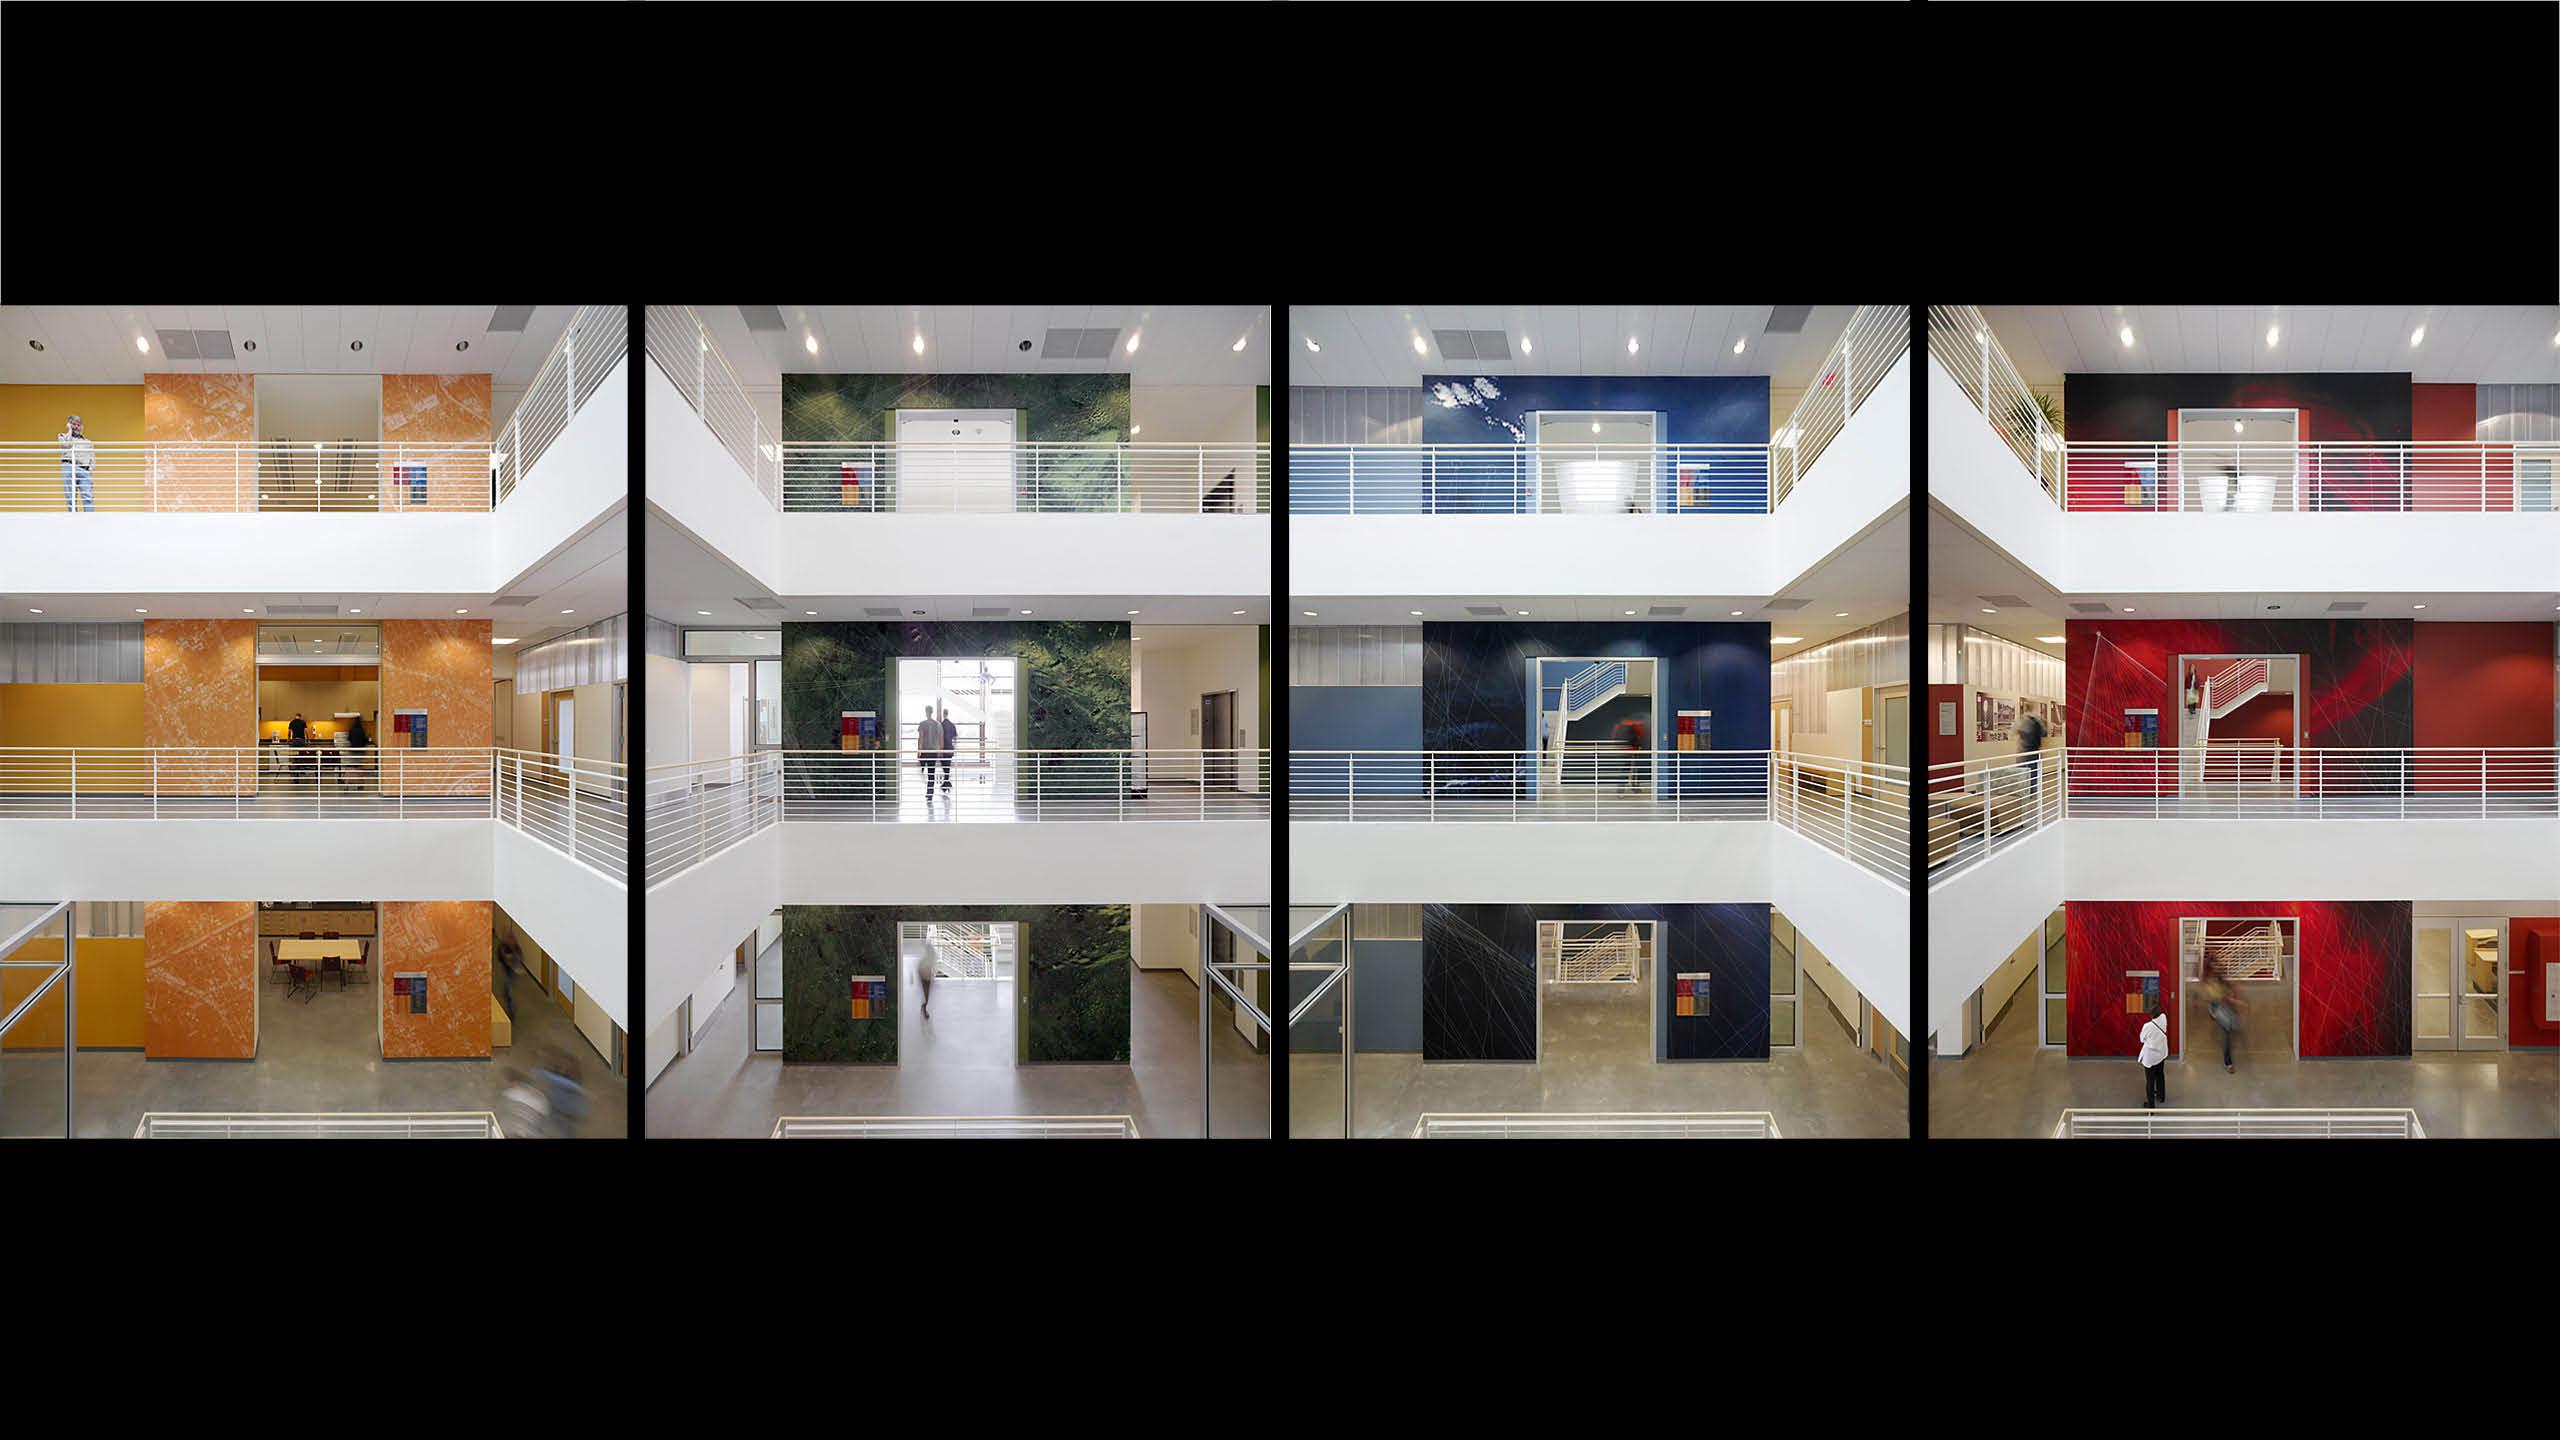 Yang and Yamazaki Environment and Energy Building – Stanford University / image 4